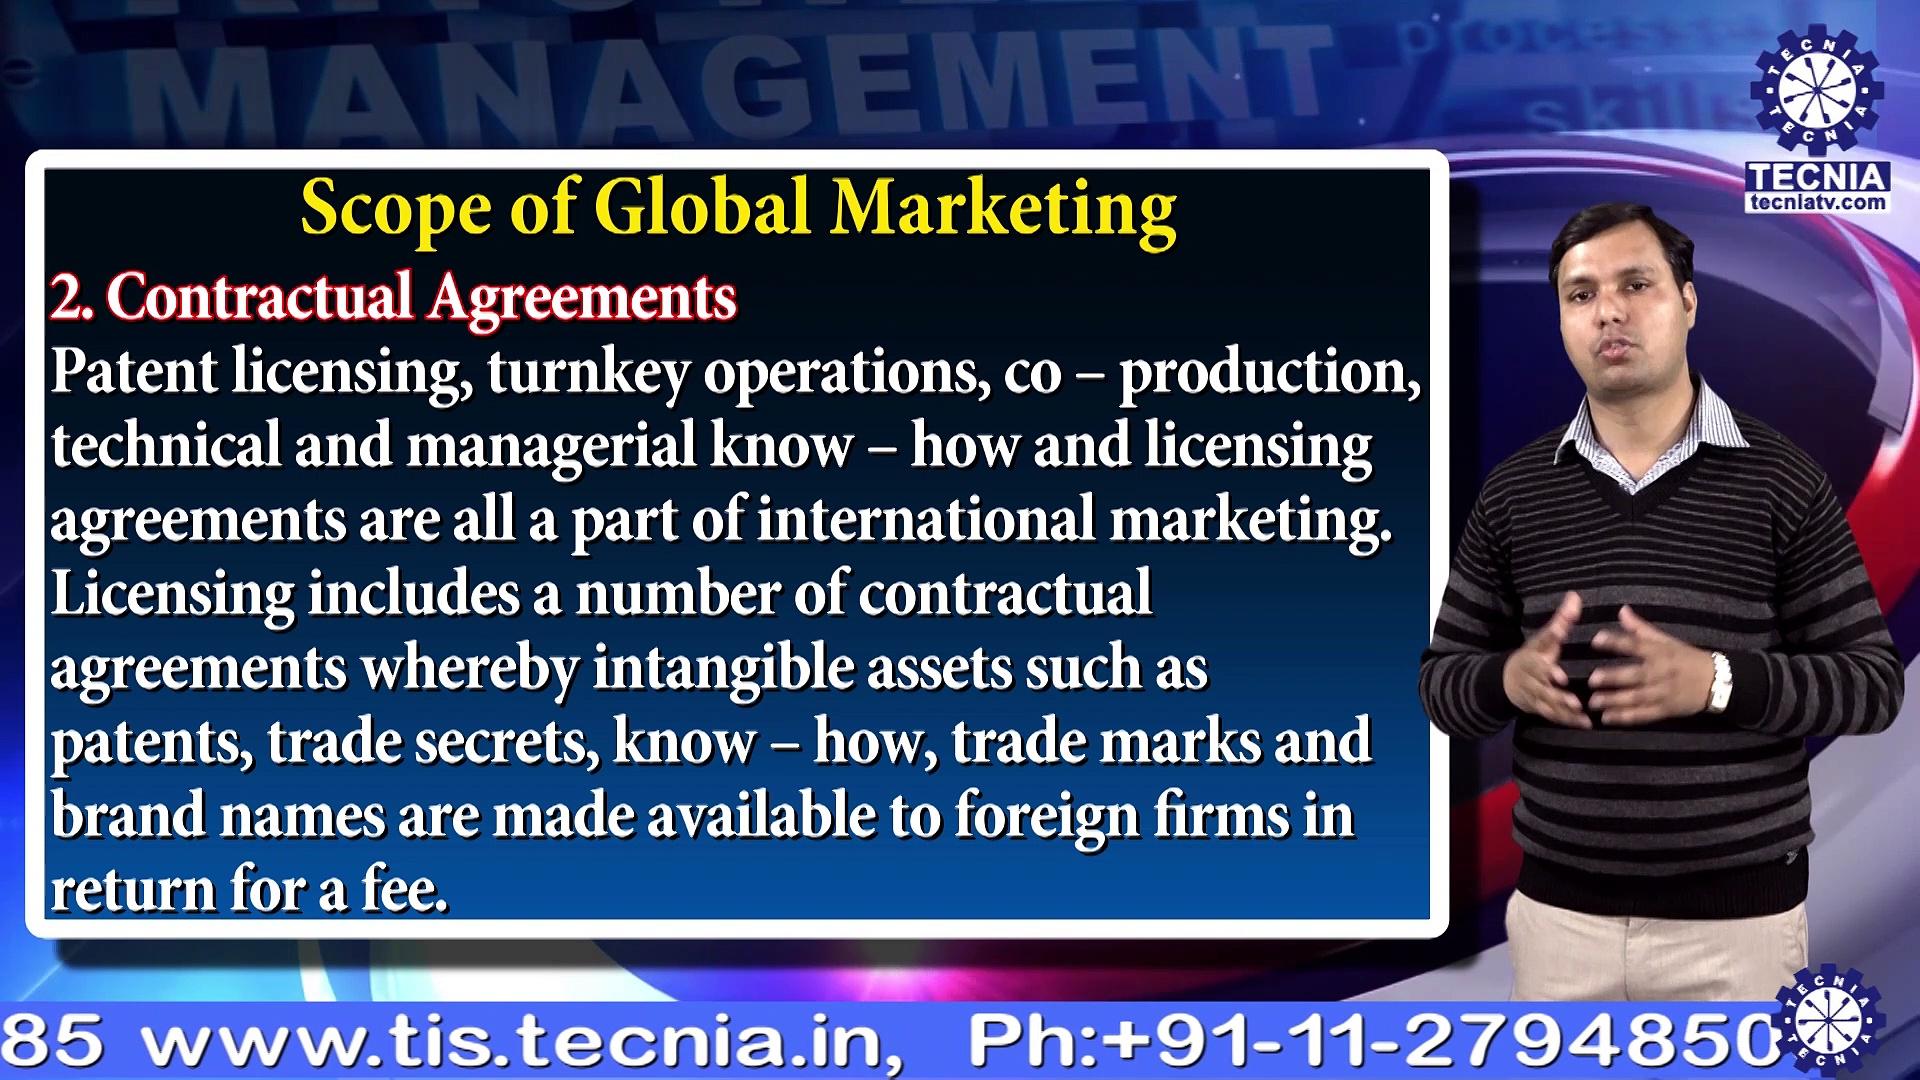 Mr. RAHUL TRIPATHI || Global Marketing Managment || MBA || TIAS || TECNIA TV